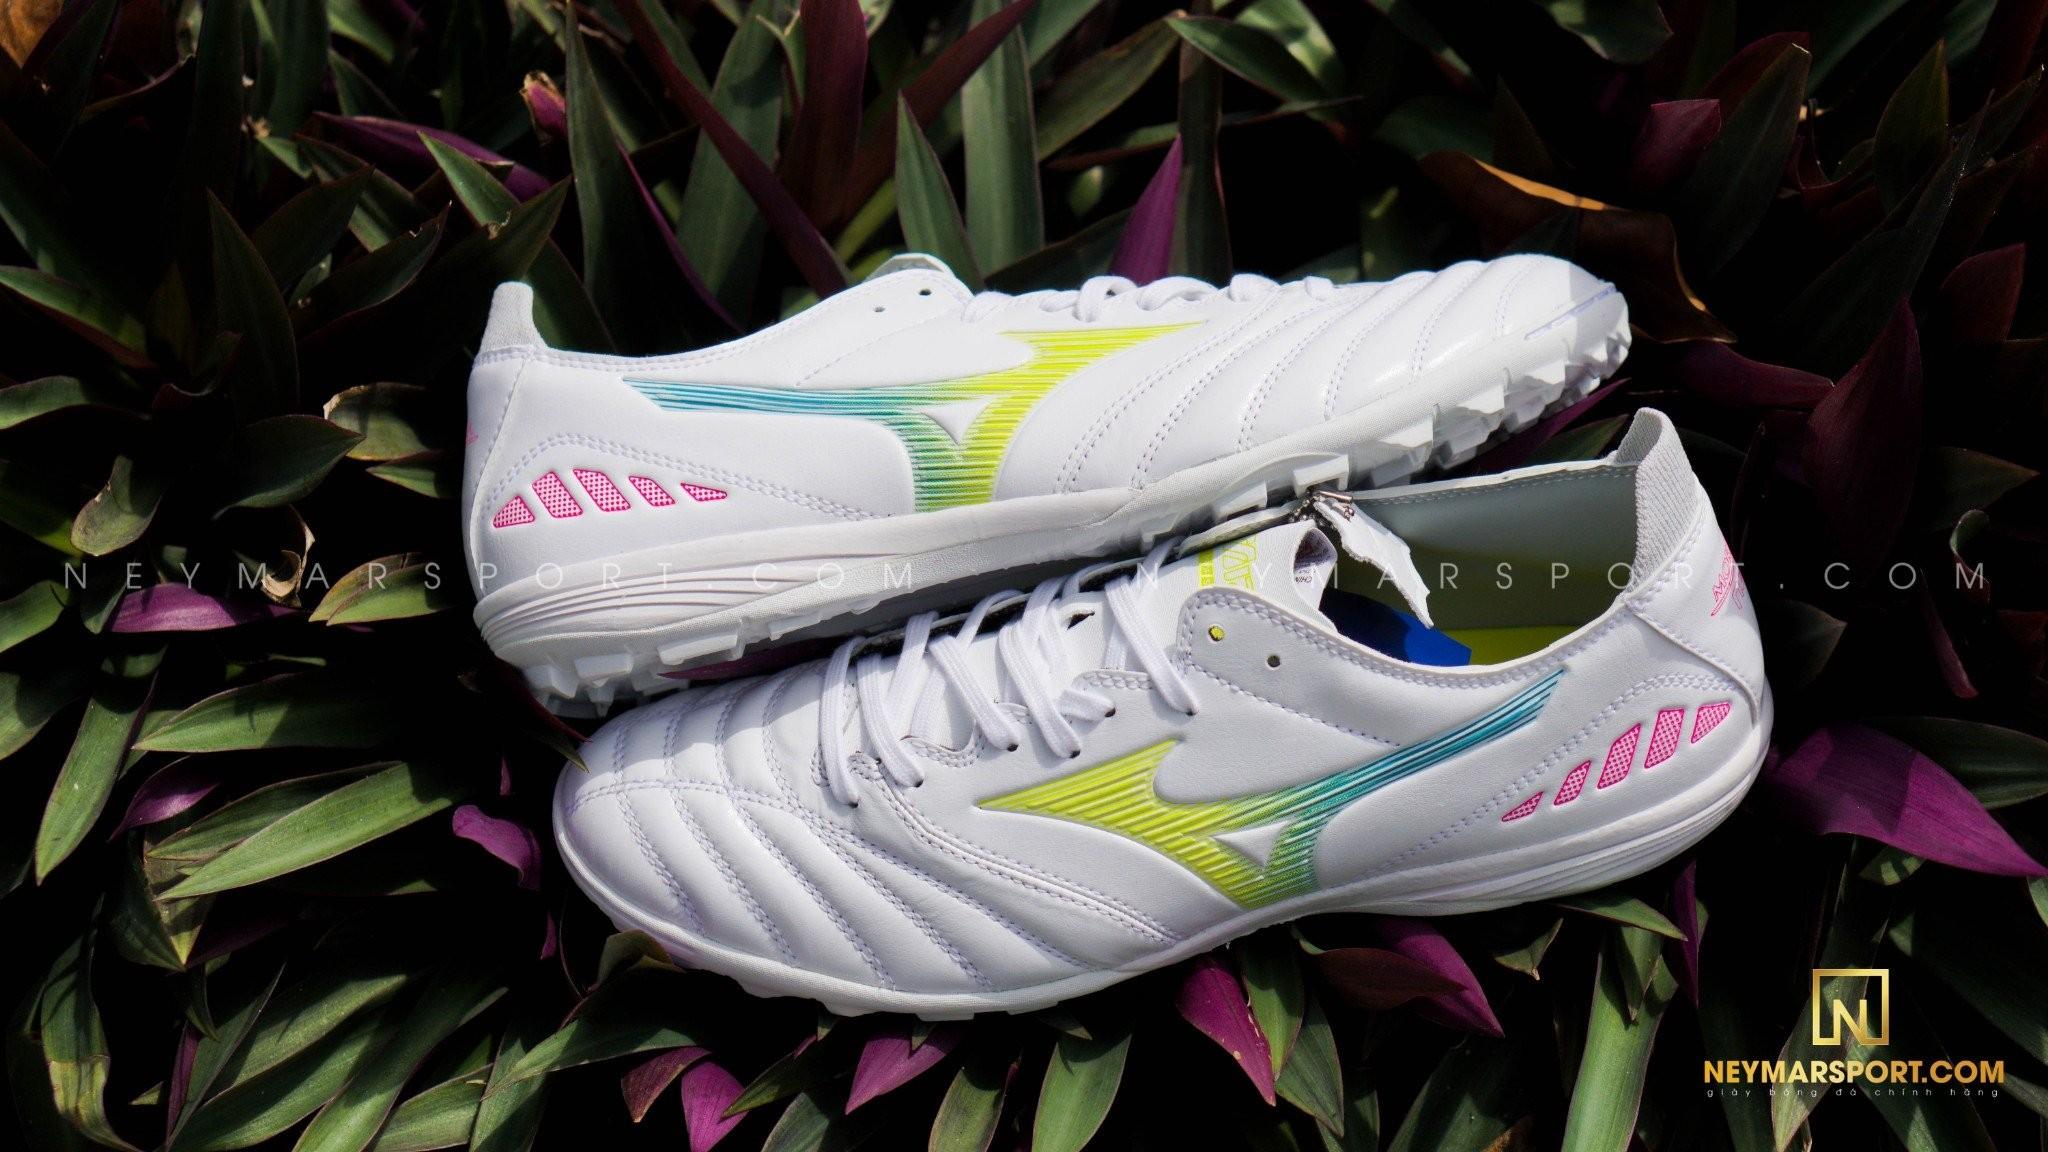 Giày đá bóng Mizuno Morelia Neo III Pro AS TF - White/Yellow/Pink